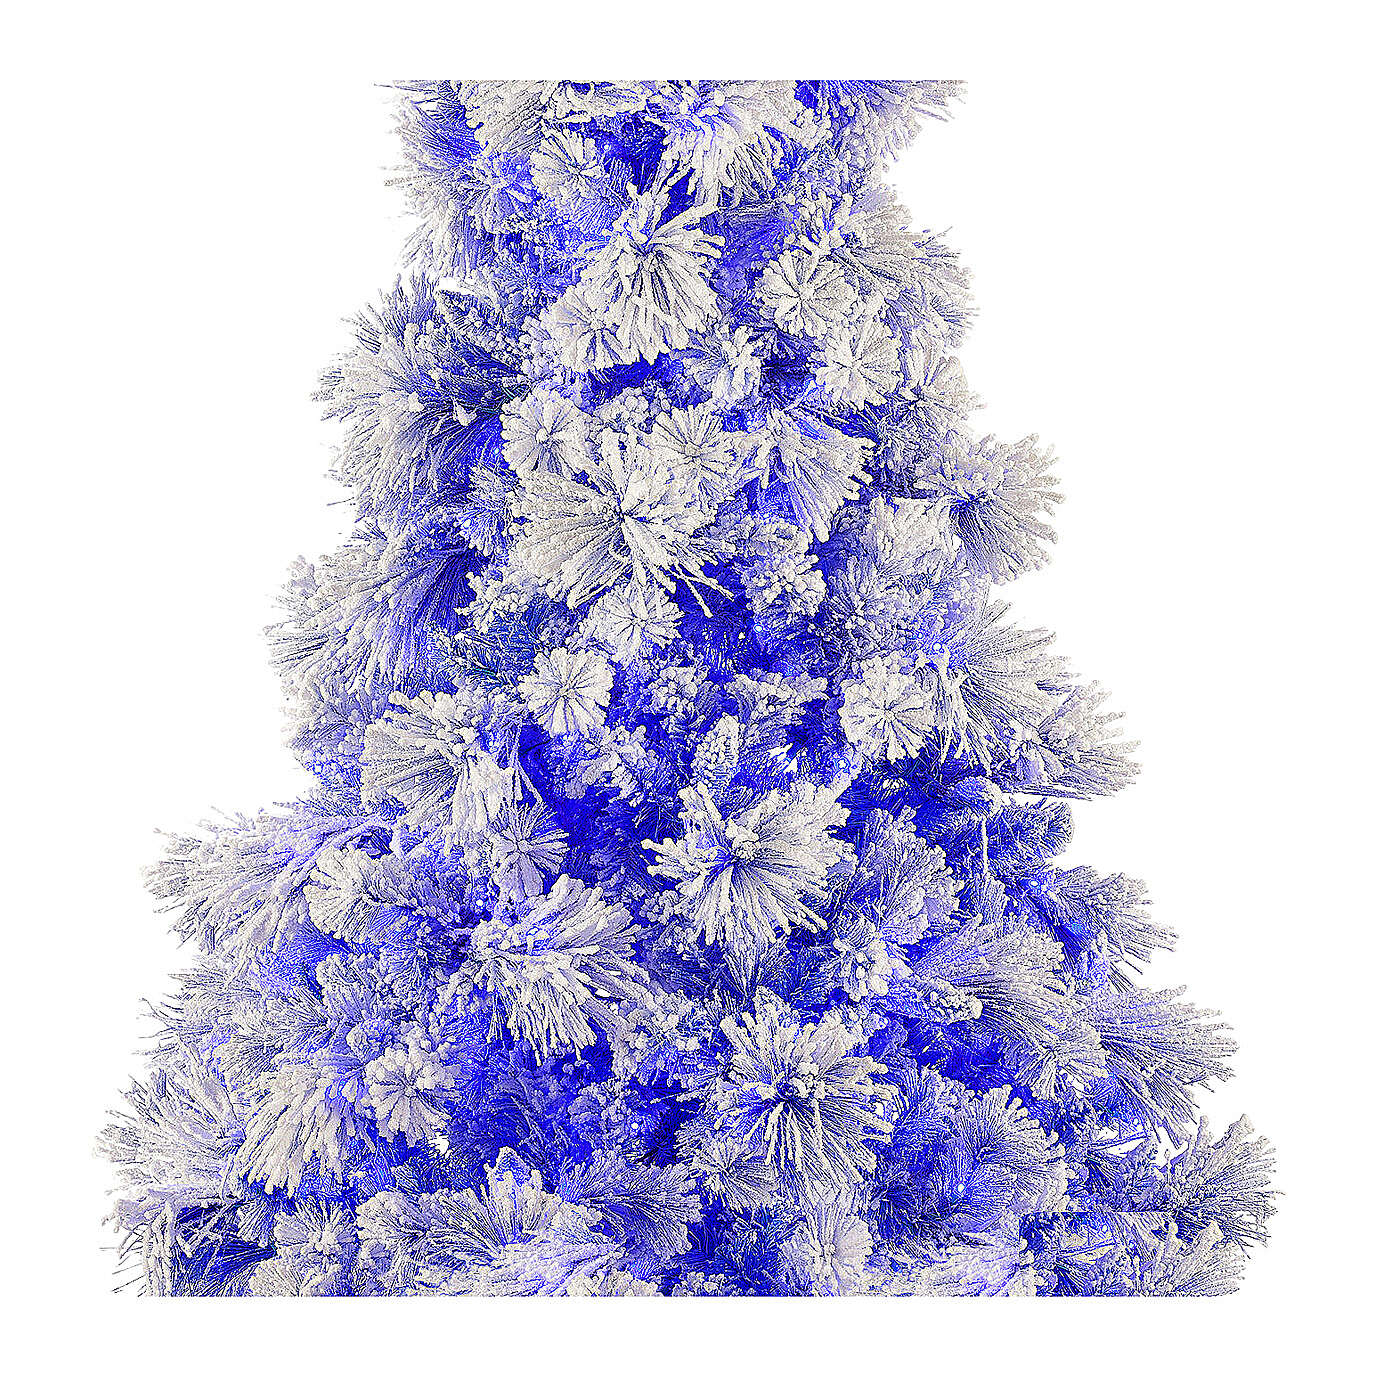 STOCK Sapin de Noël Virginia Blue enneigé 340 cm avec 1100 LED 3